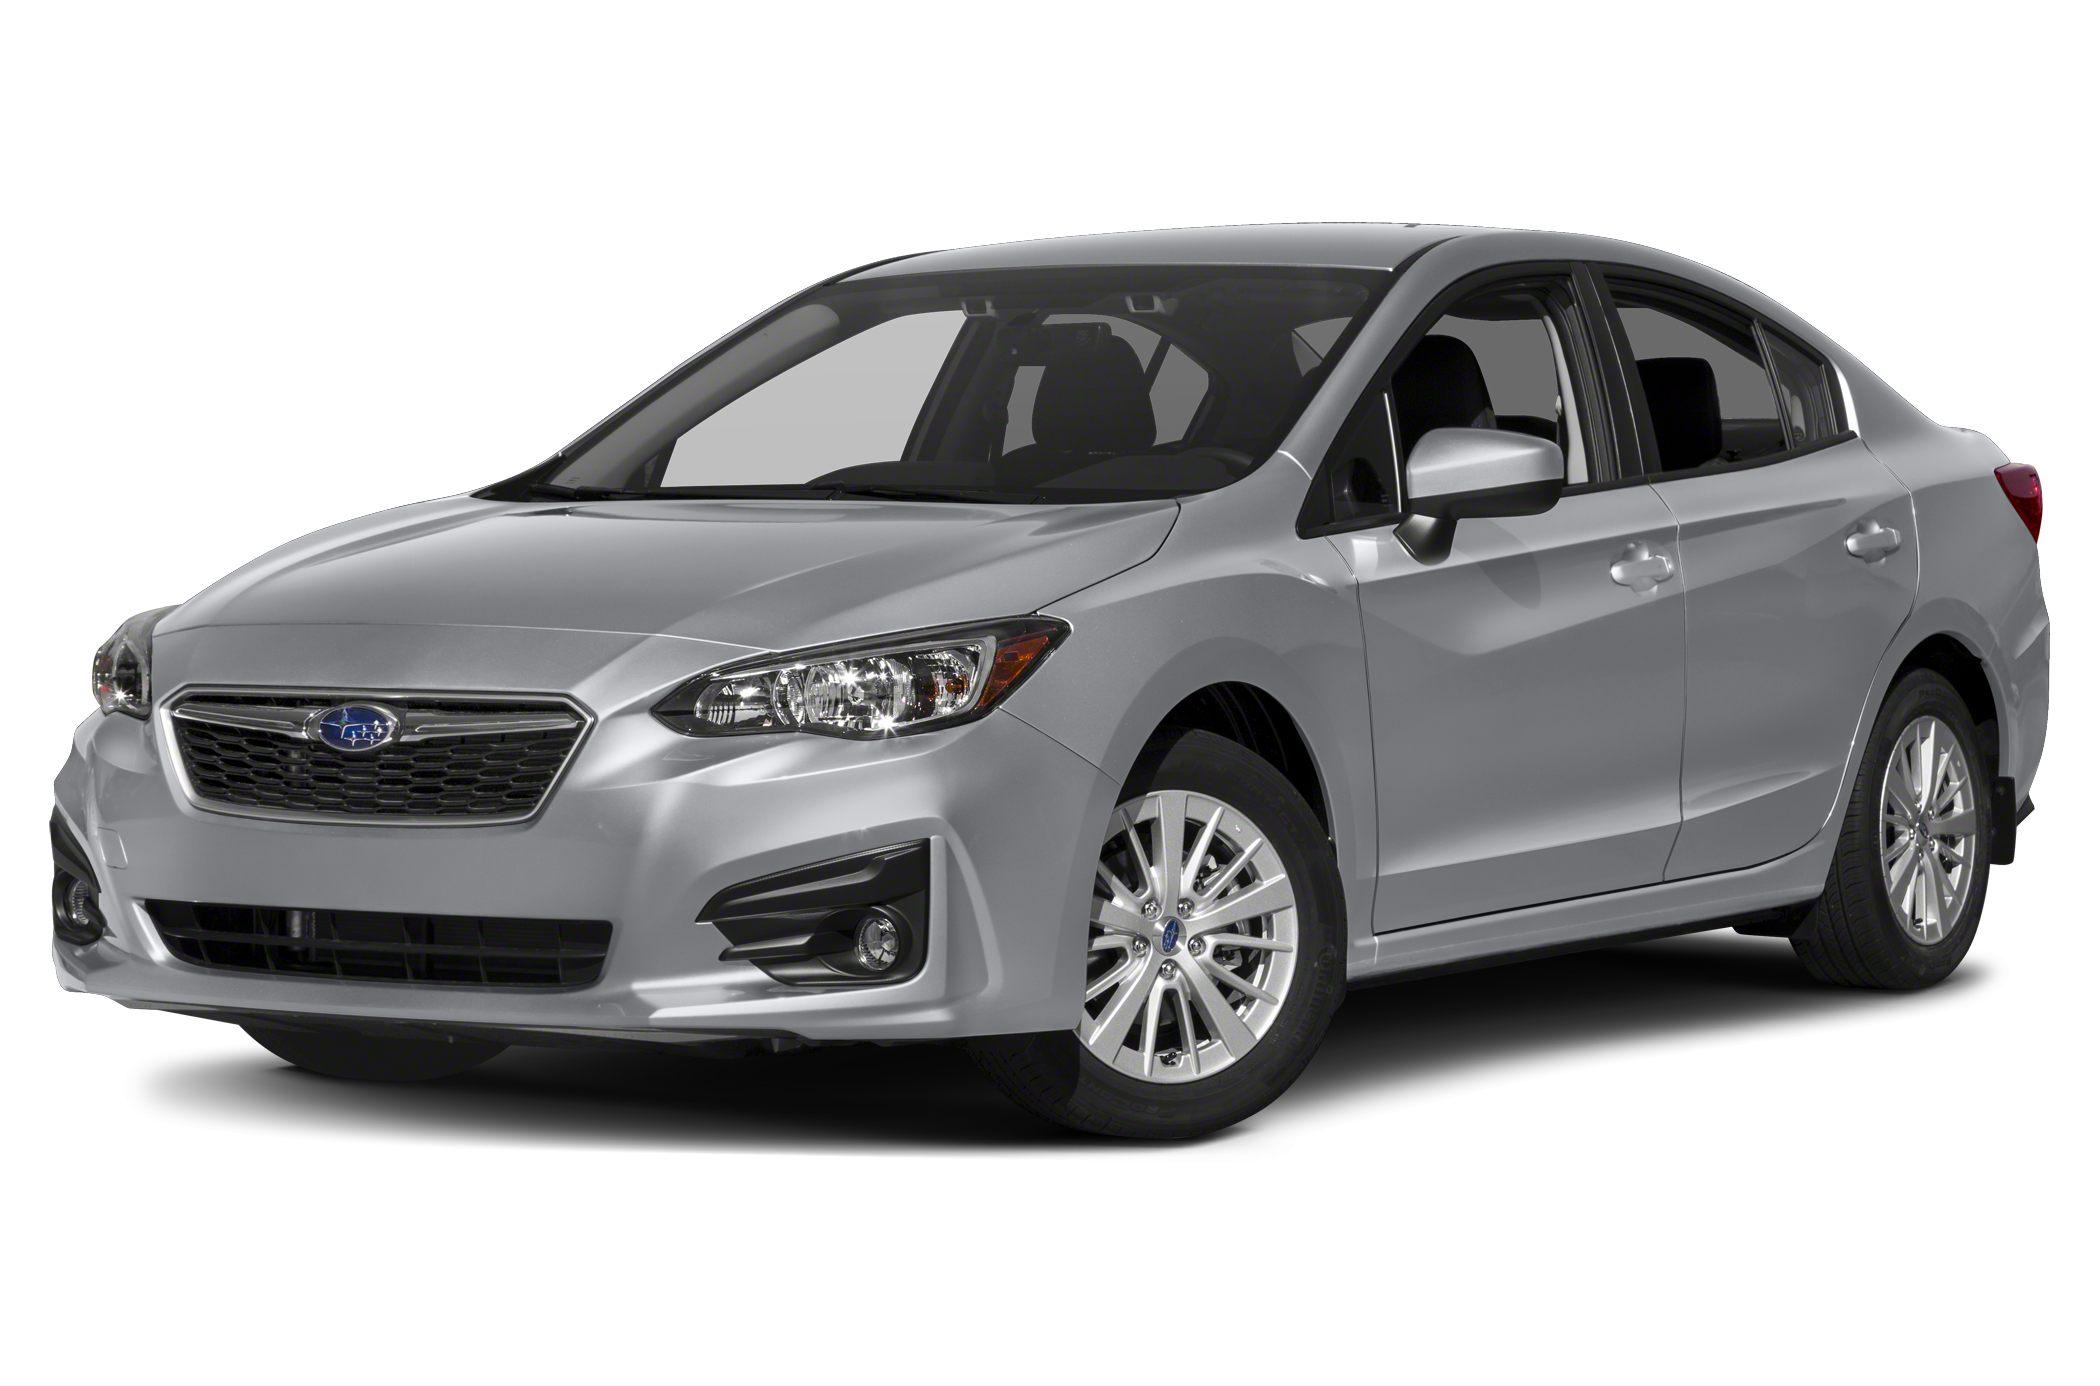 2017 Subaru Impreza 2.0i Premium 4dr All-wheel Drive Sedan